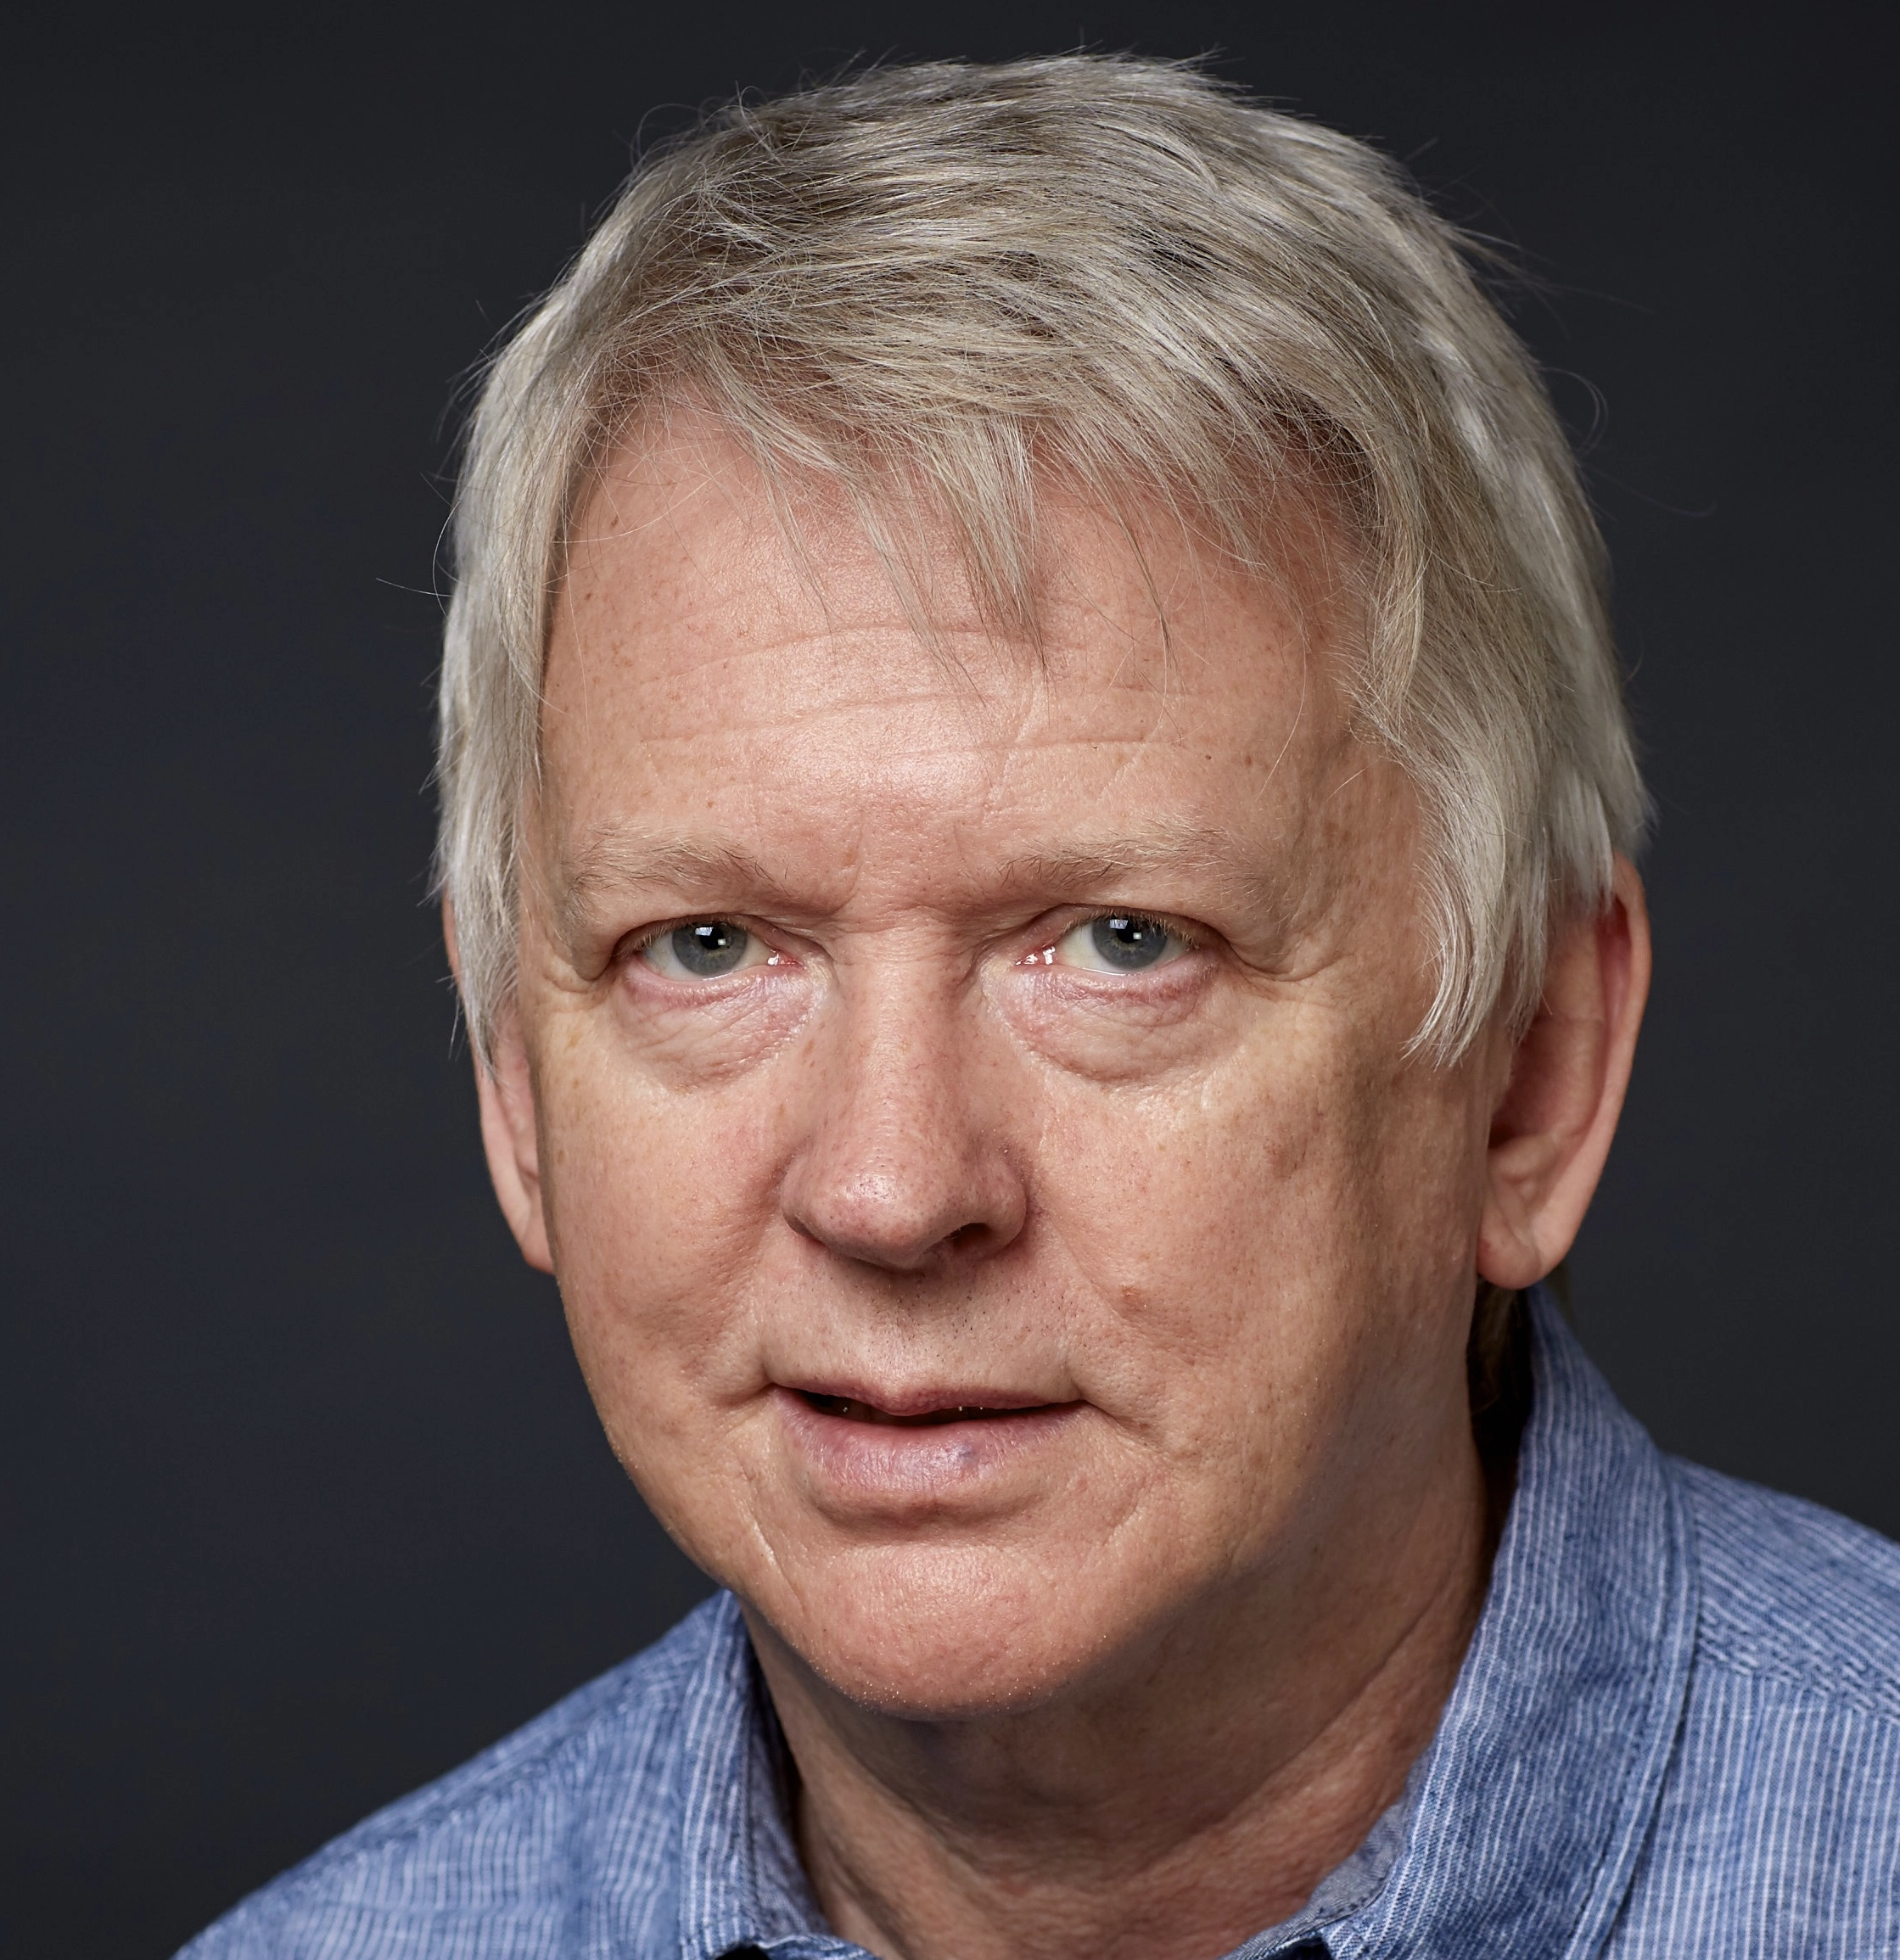 Professor Peter Aggleton